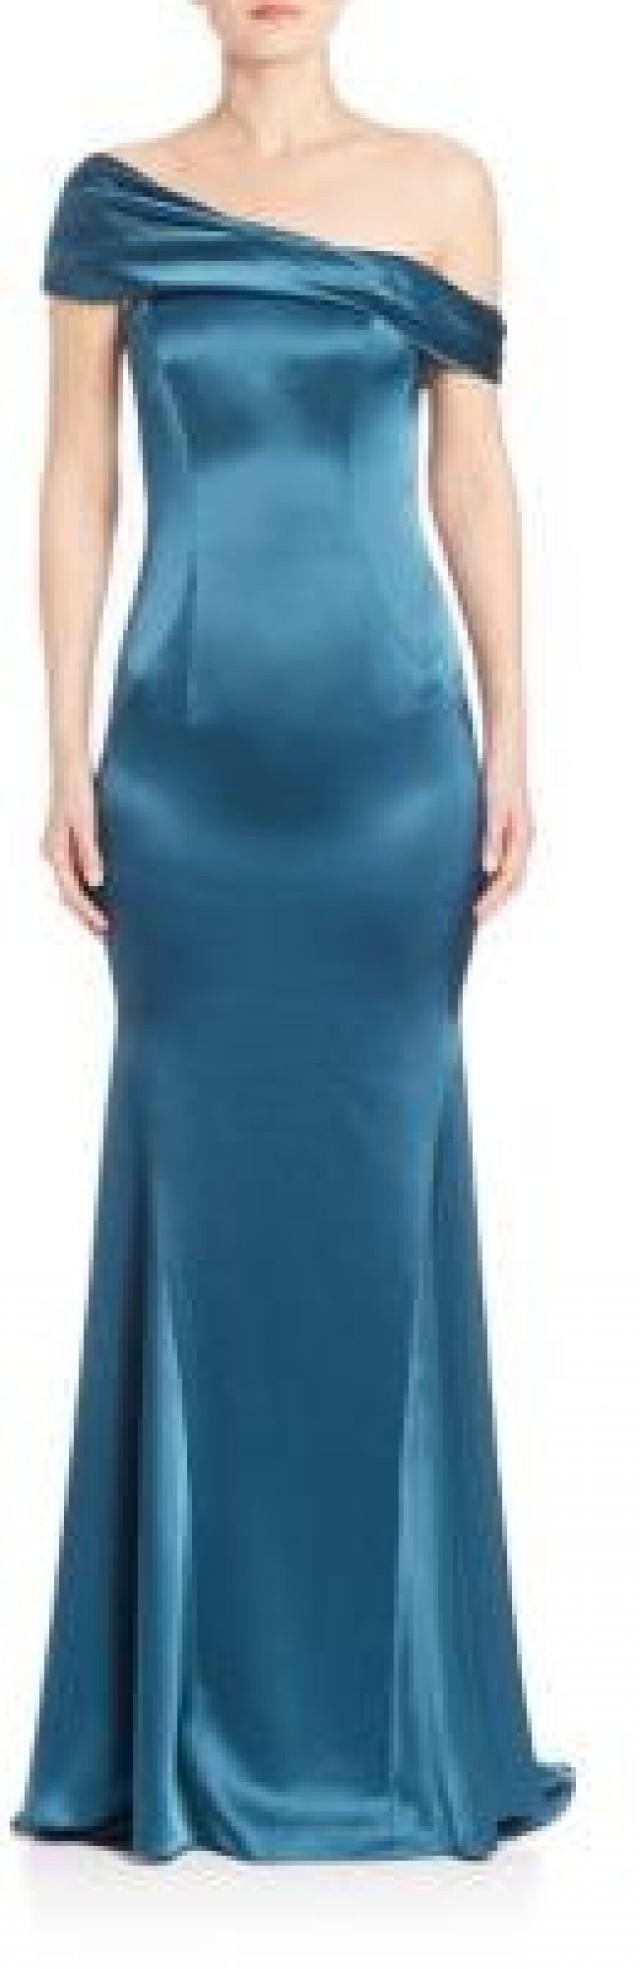 St. John One-Shoulder Gown #2626466 - Weddbook